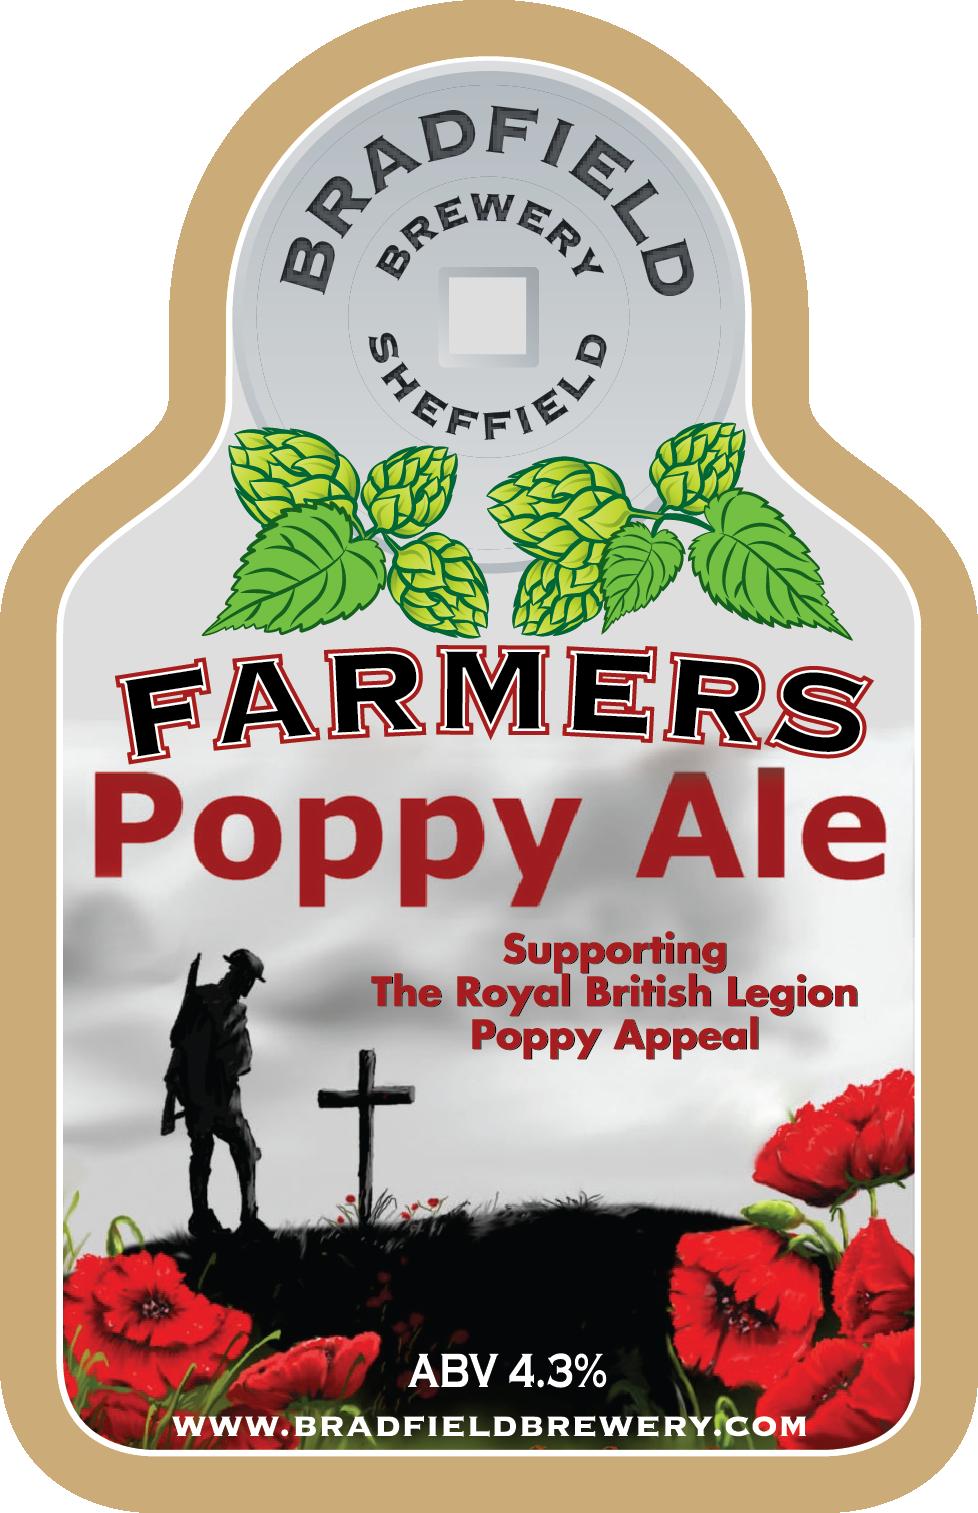 Farmers Poppy Ale